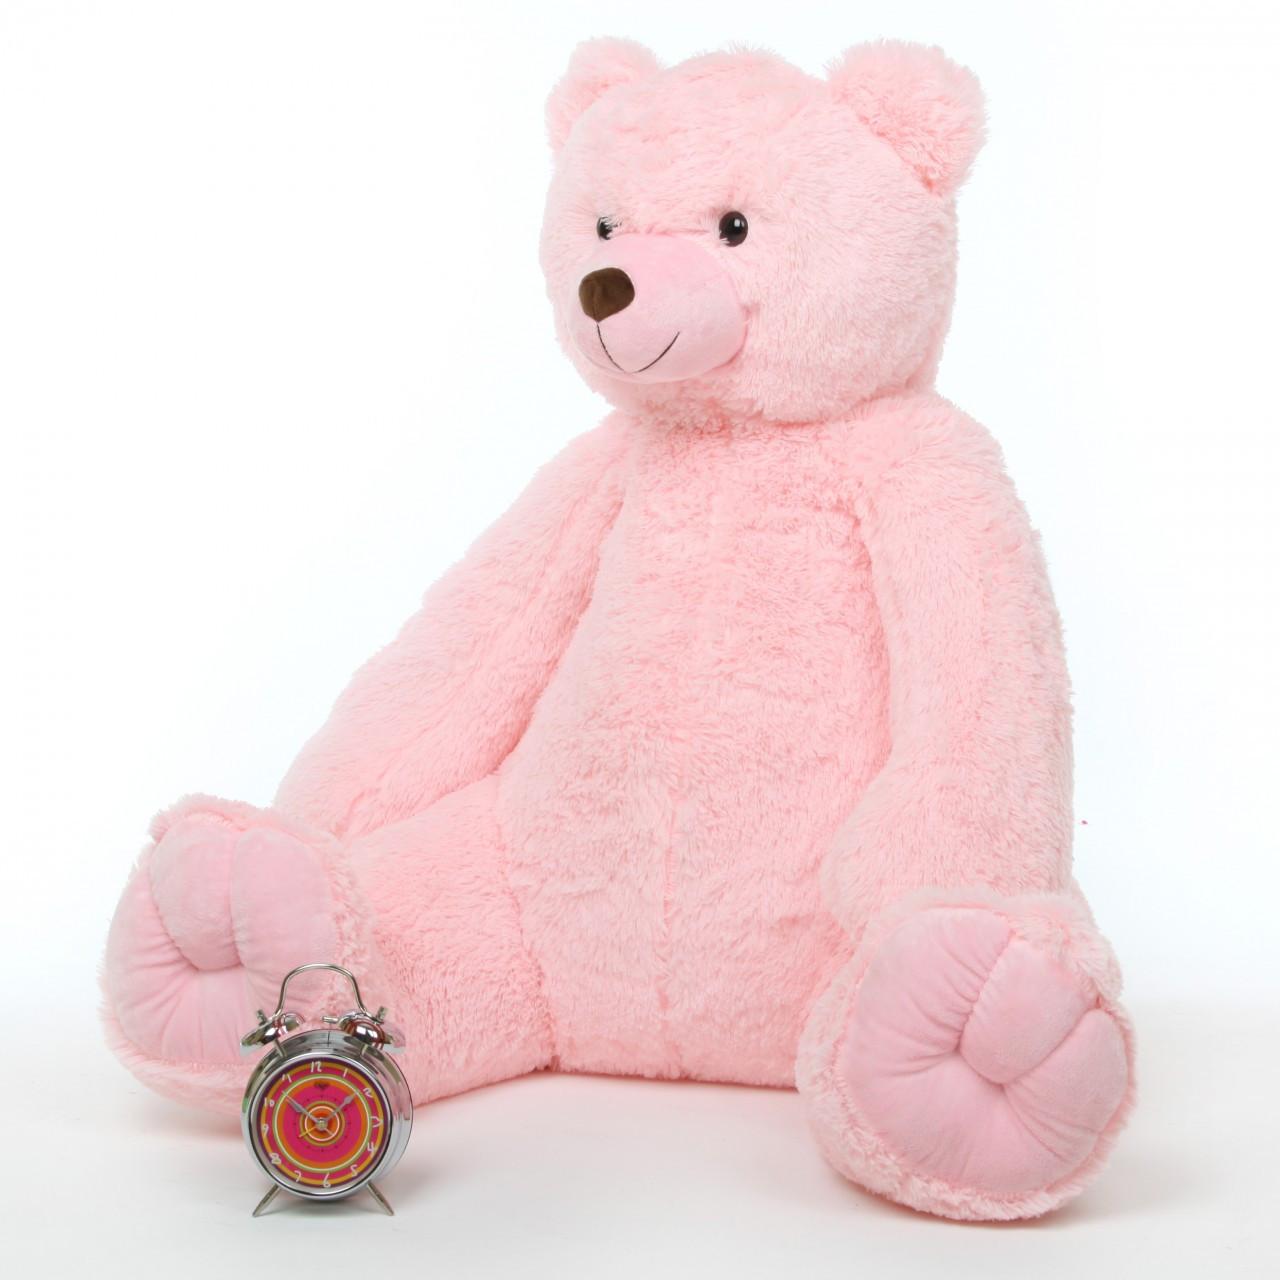 darling tubs 42 pink jumbo stuffed teddy bear giant teddy bear